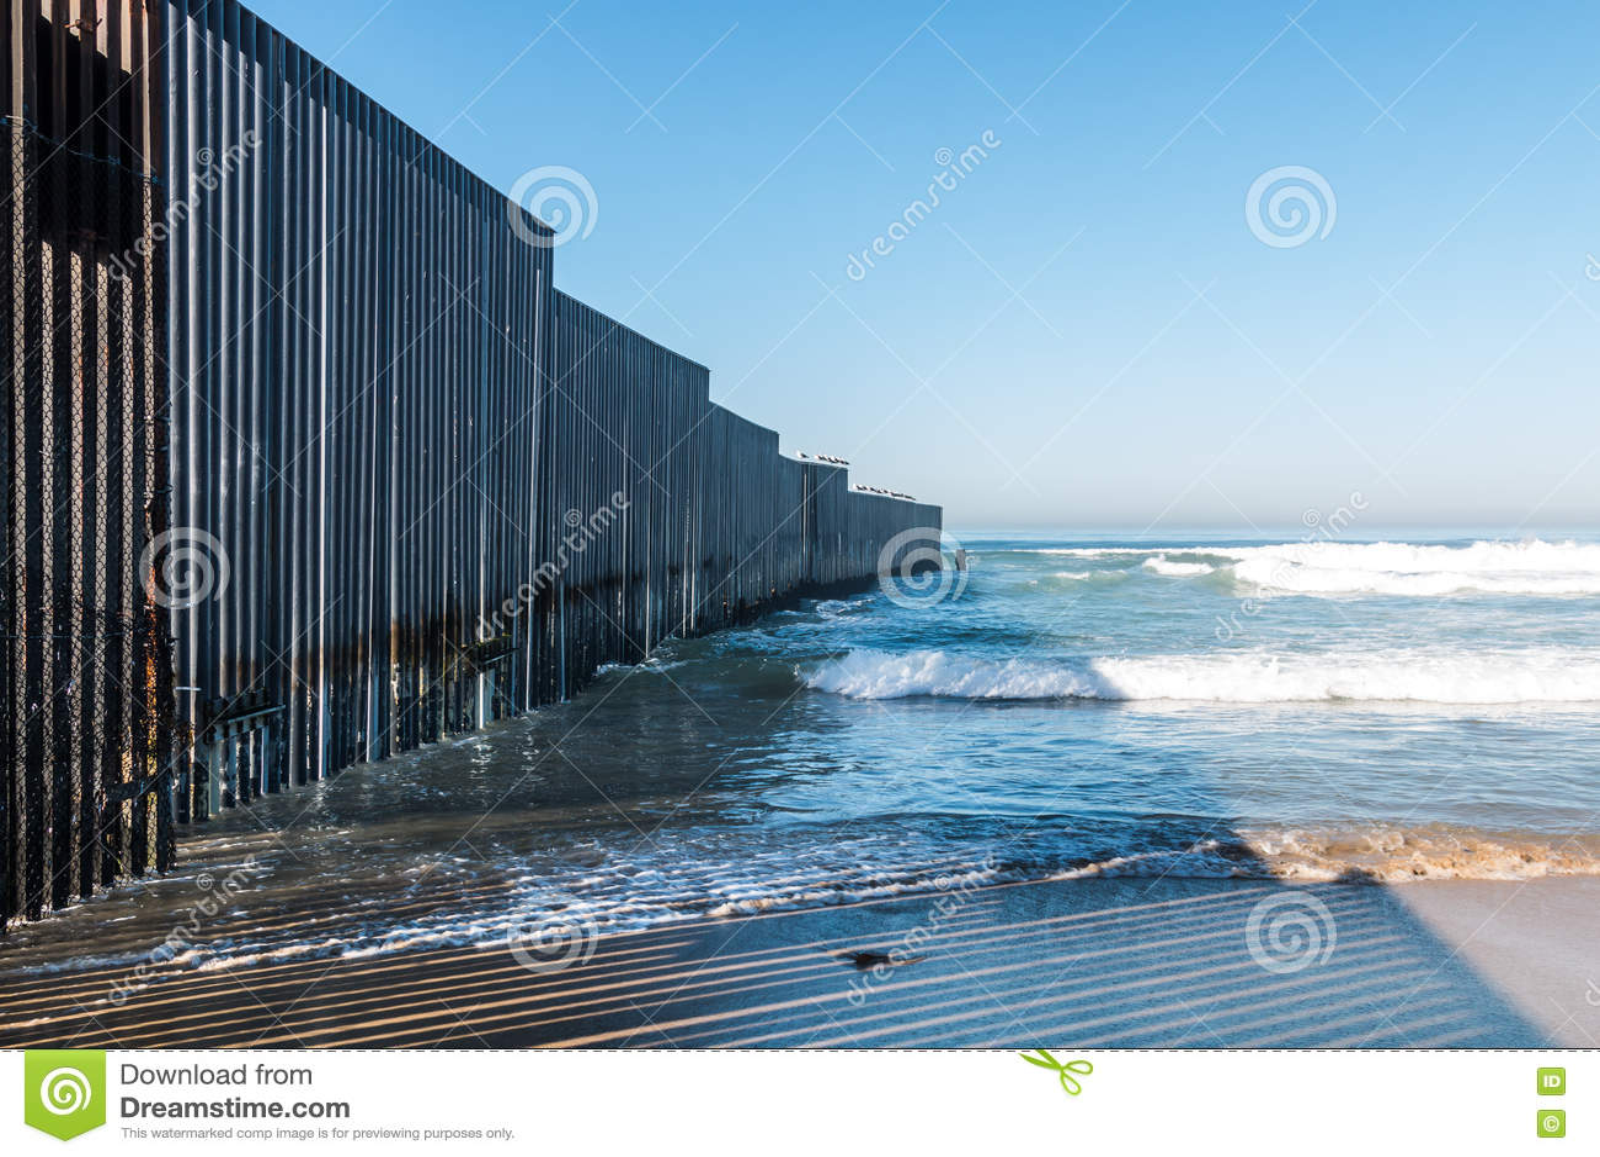 Mexican border patrol agent fucks biatch 2